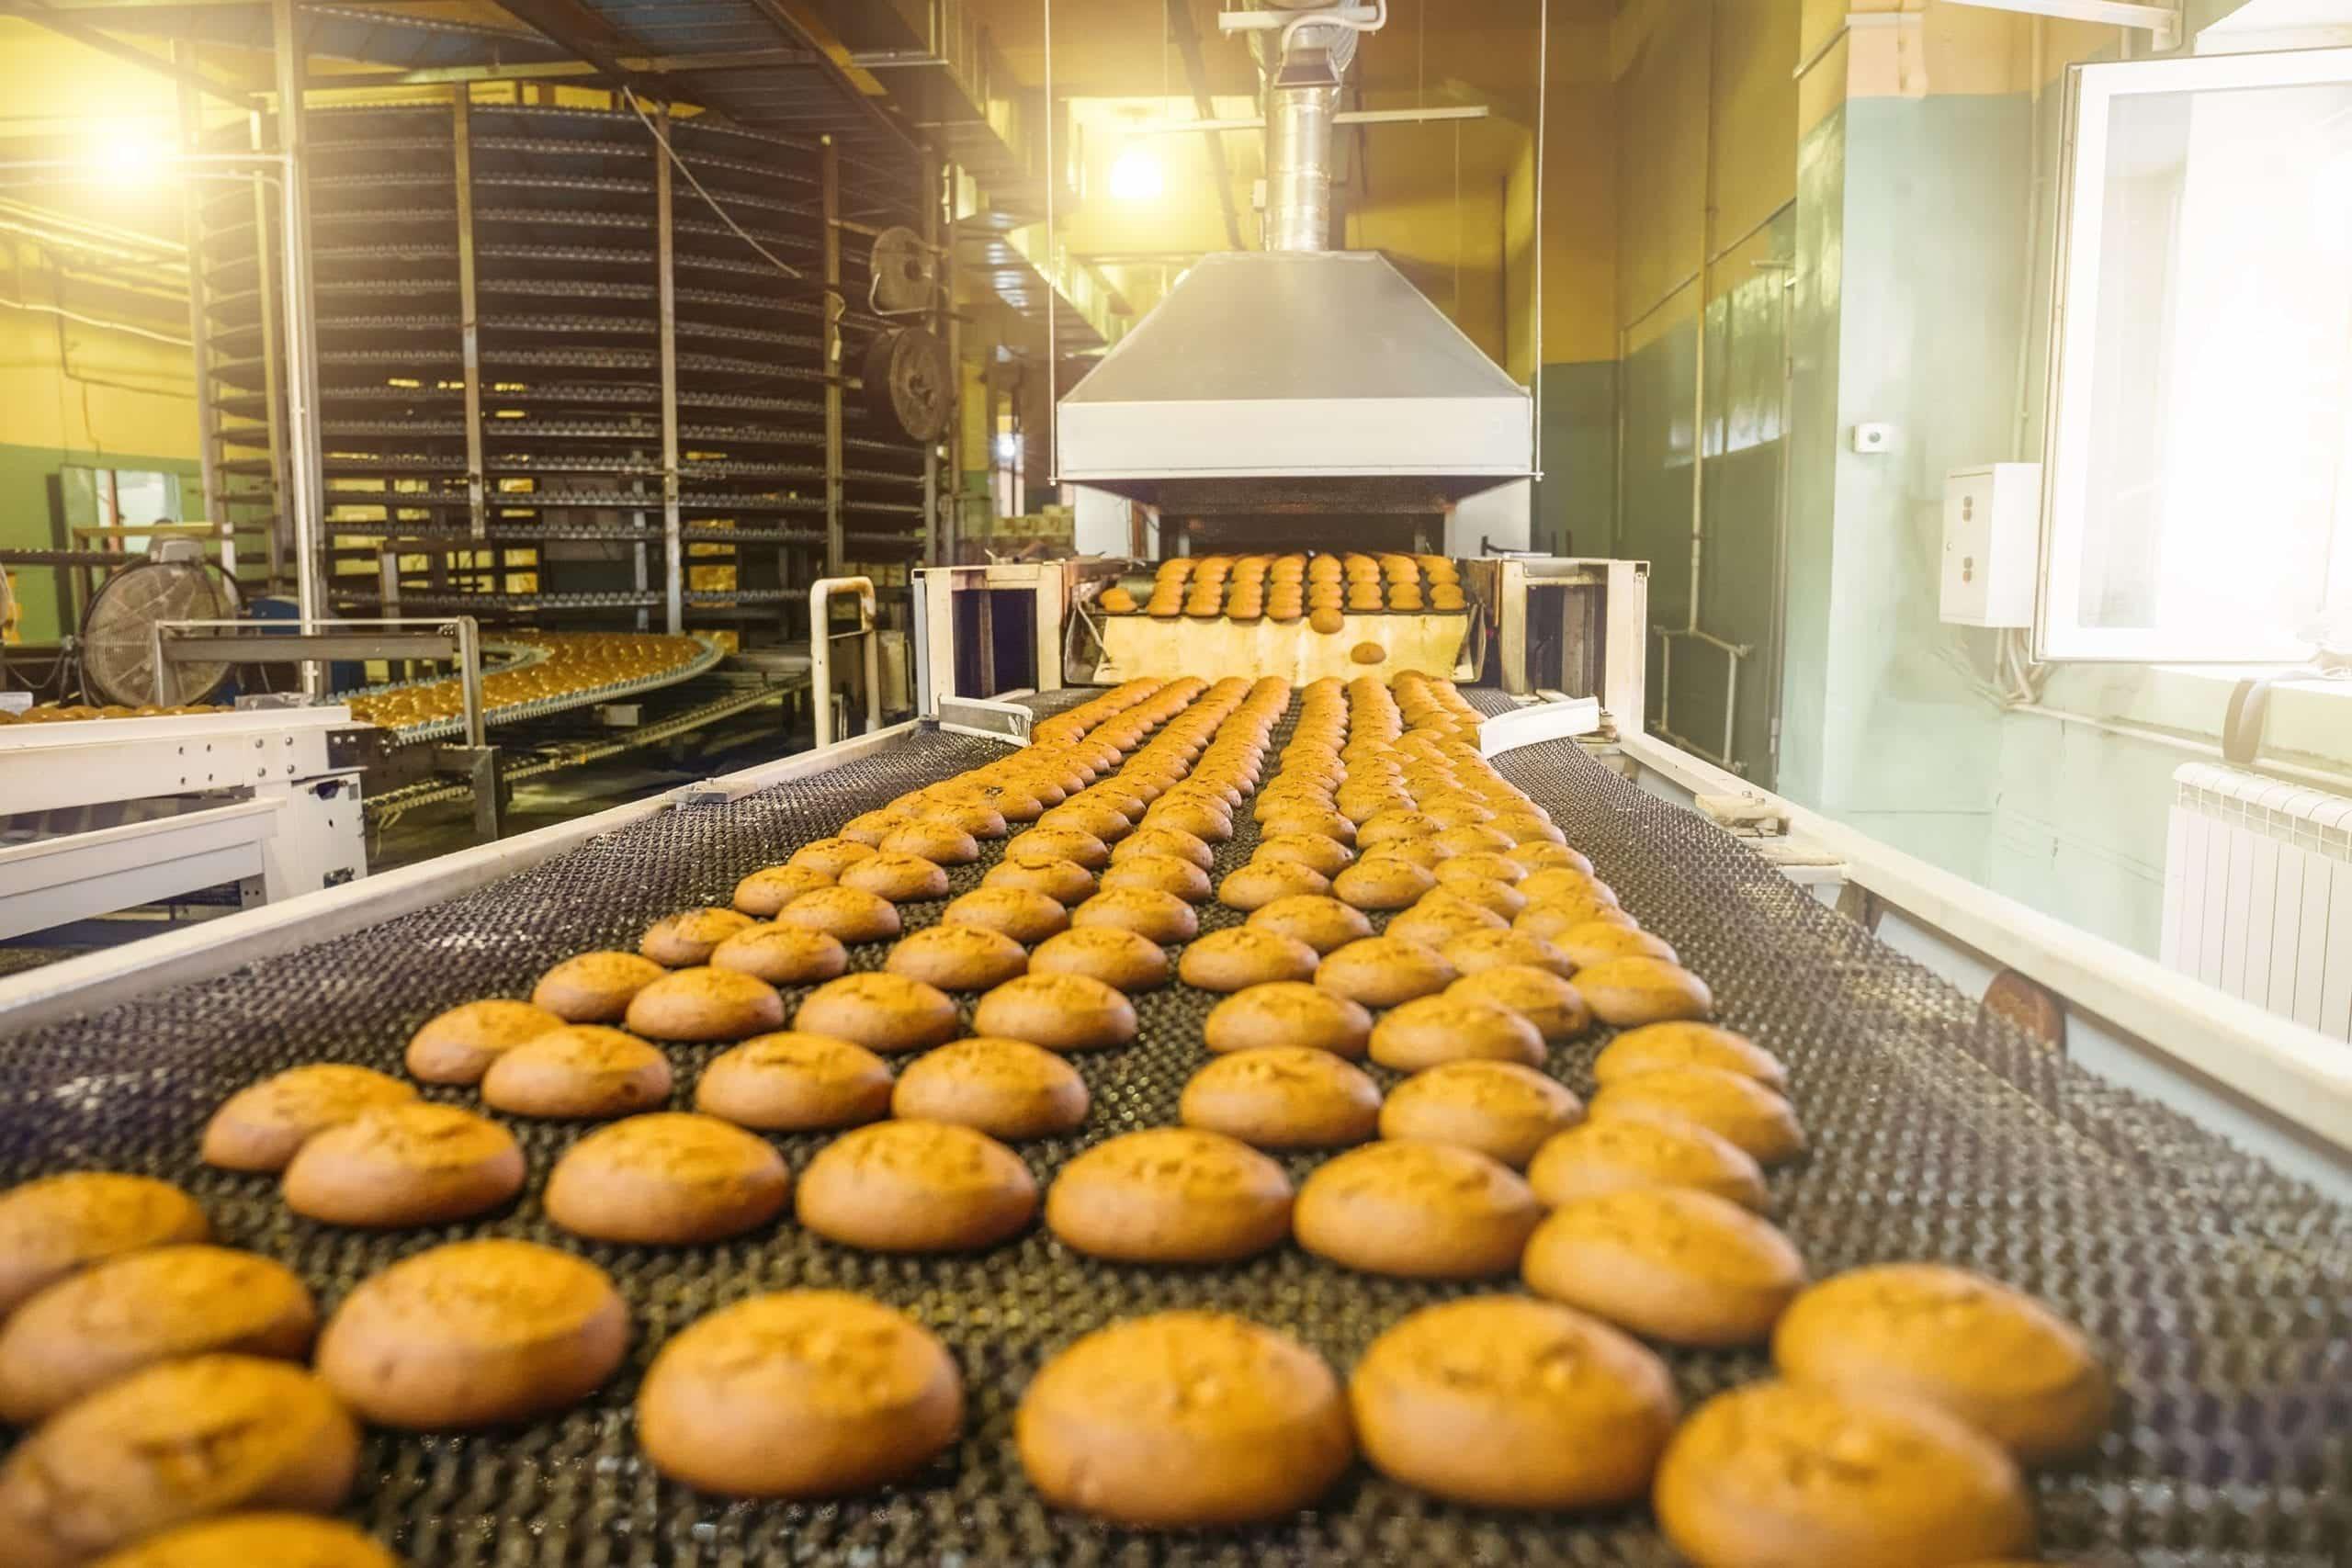 conveyor belt for baking industry